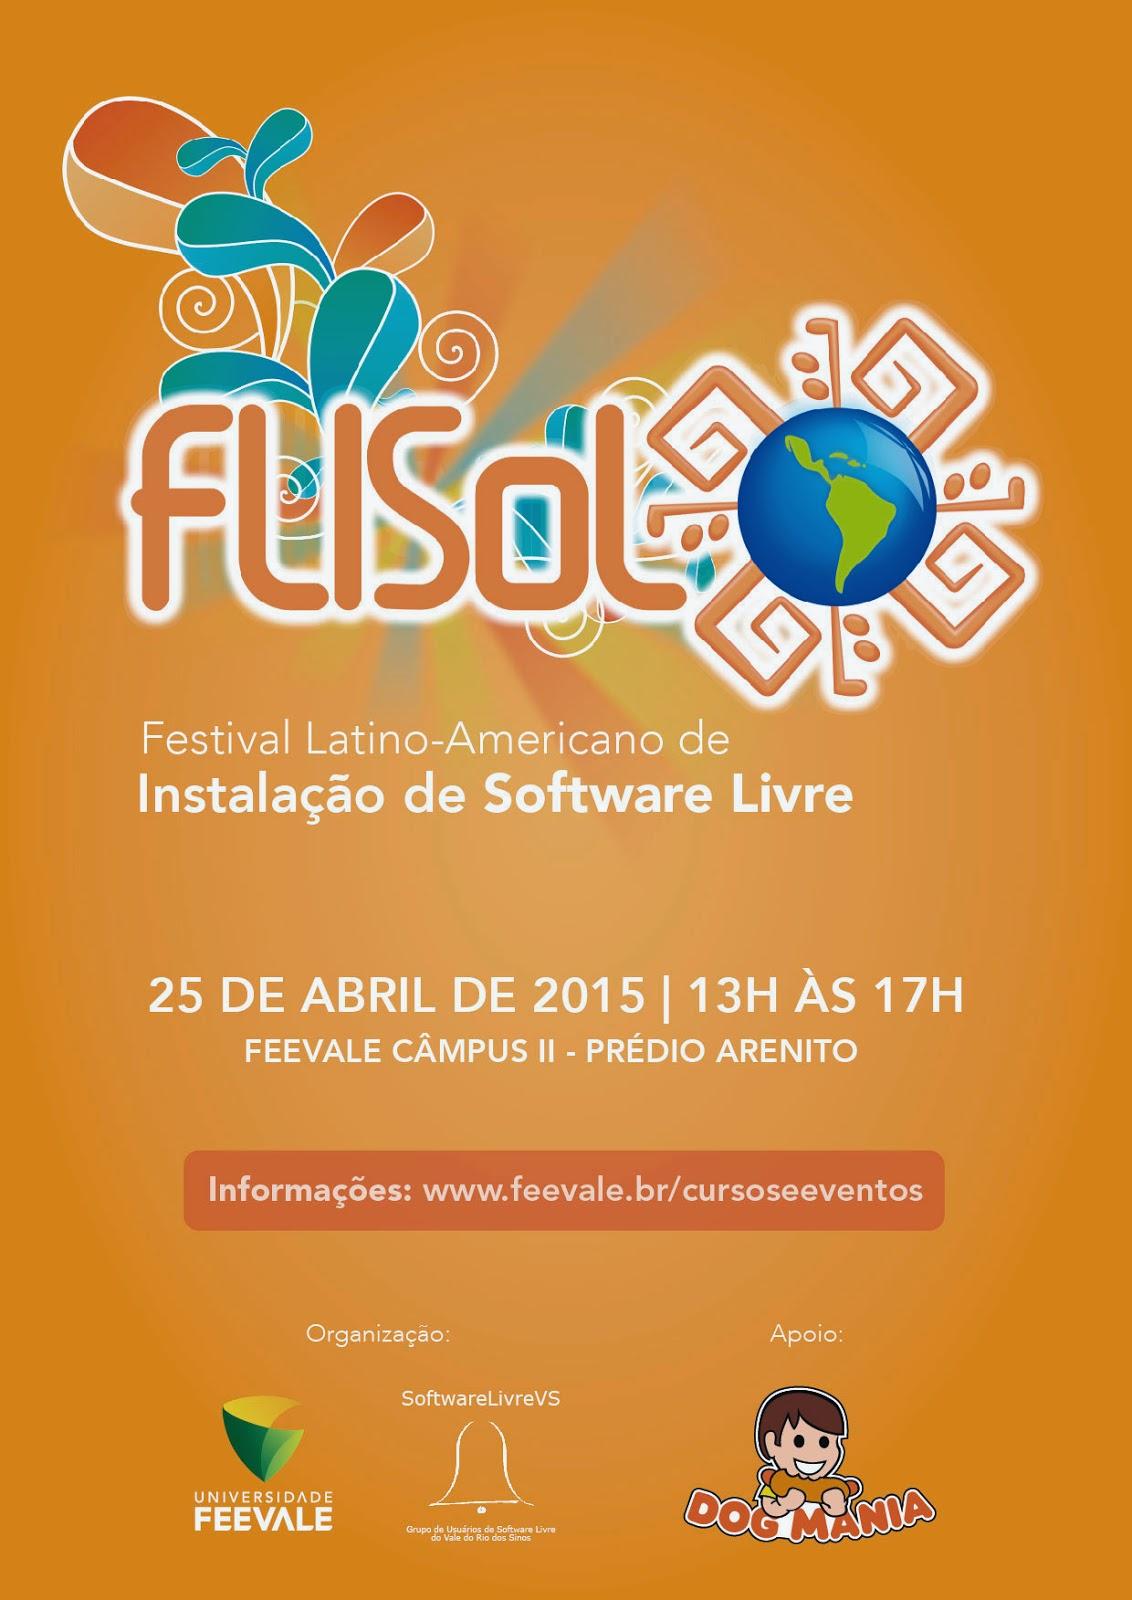 flisol 2015 slvs feevale